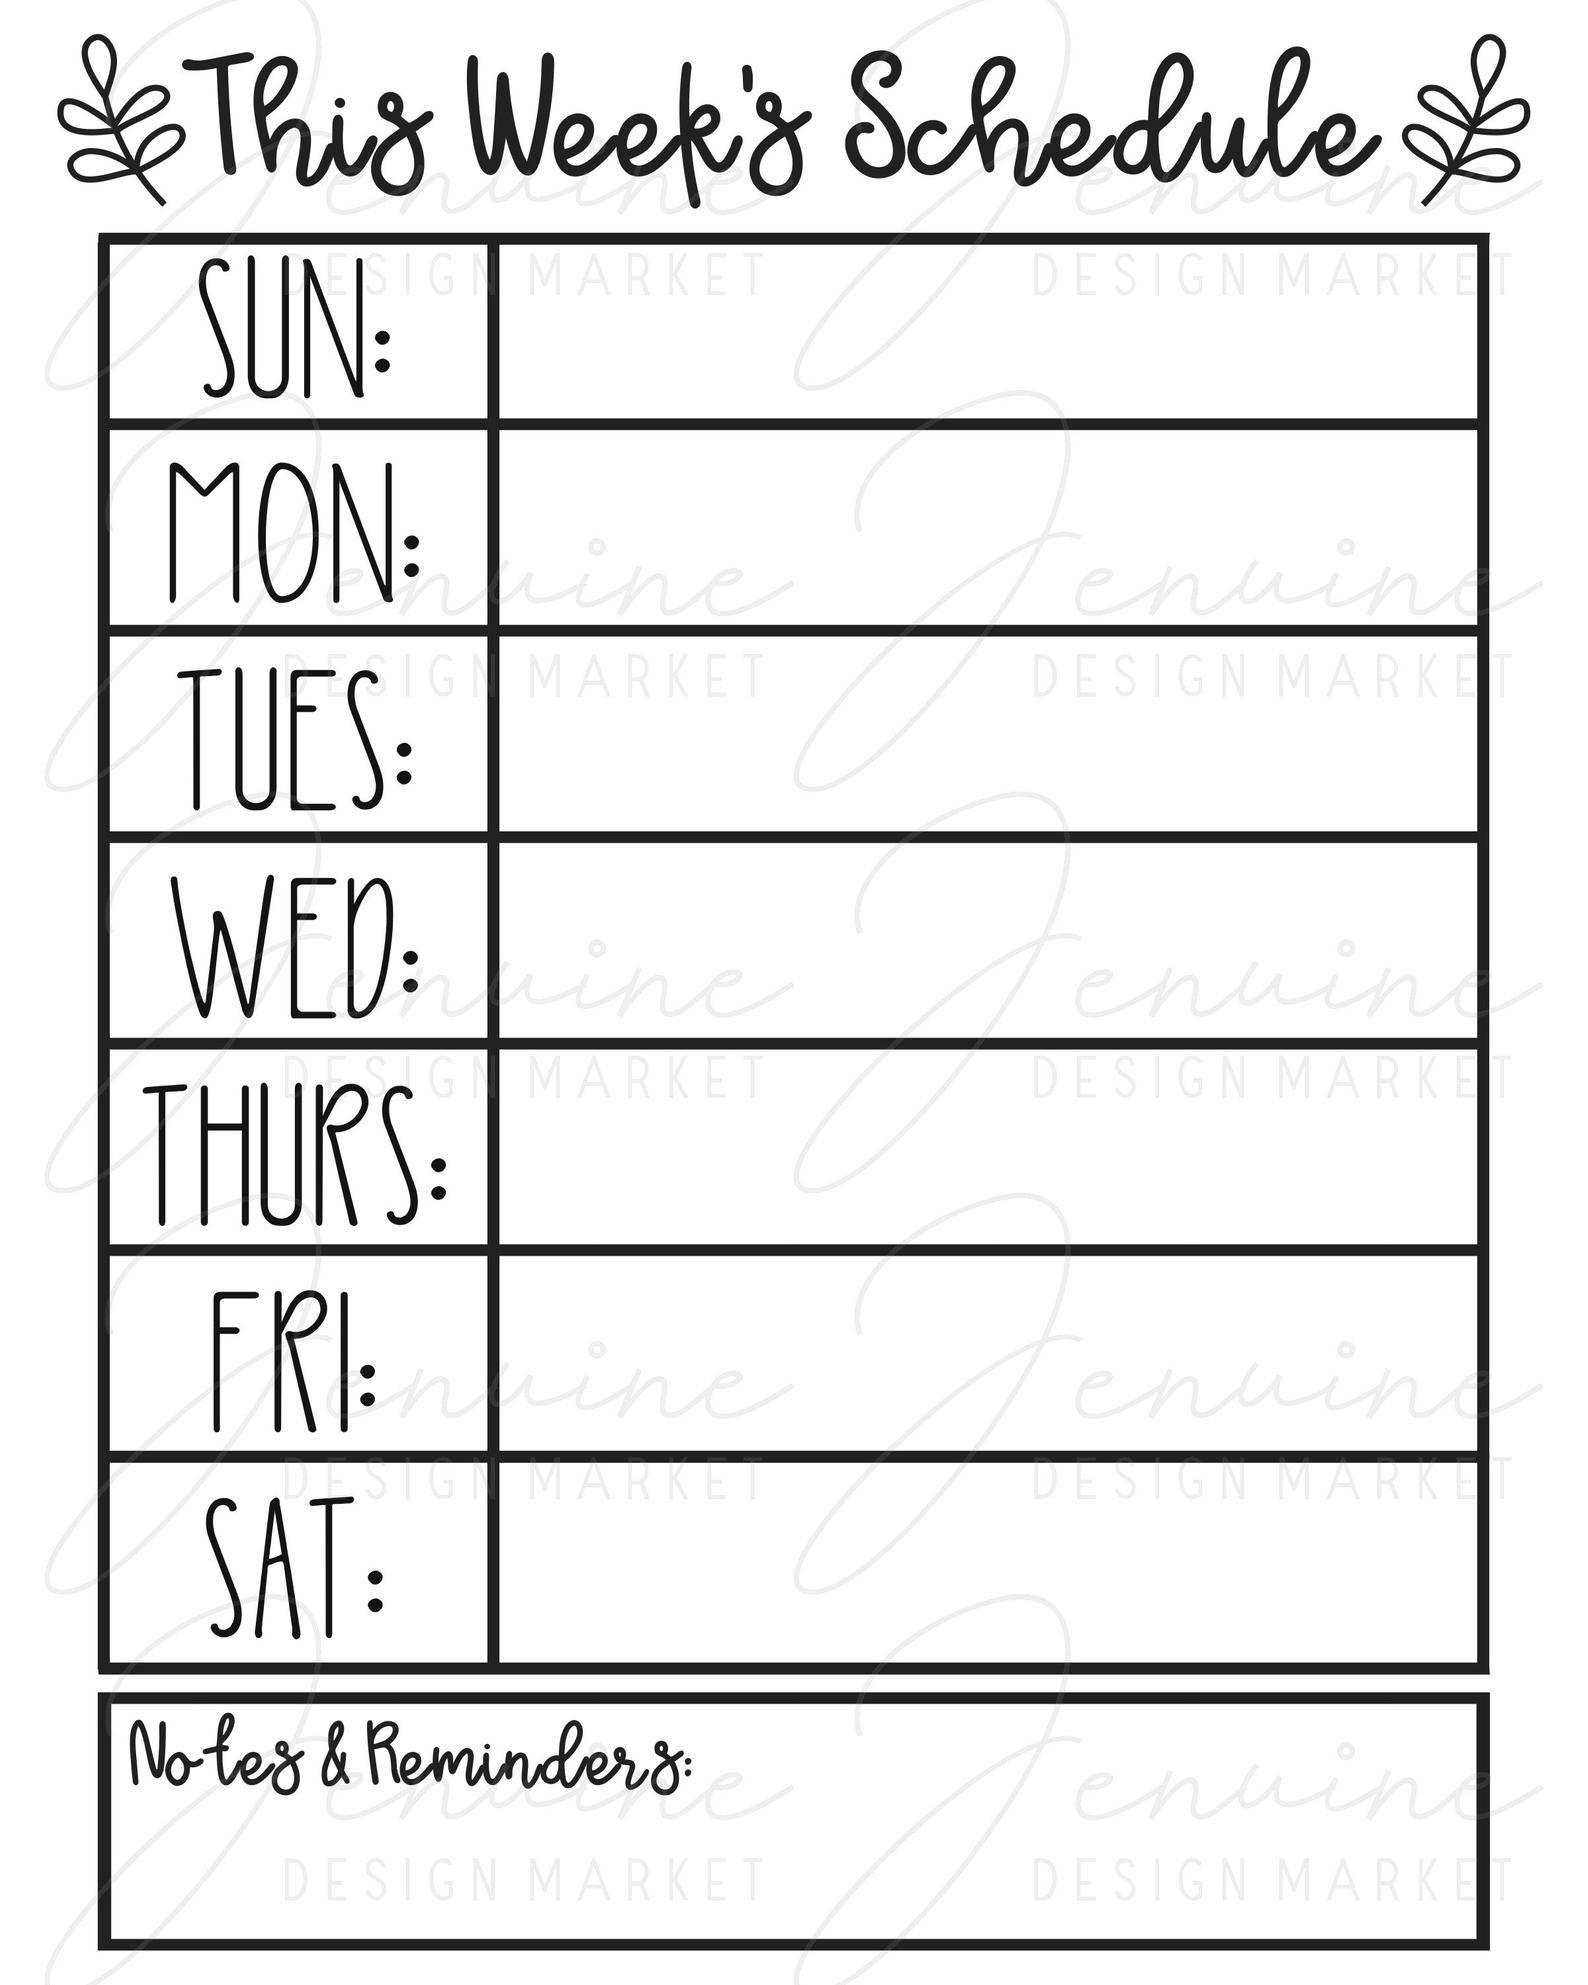 This Week S Schedule Svg Weekly Planner Printable Command Center Printable In 2021 Weekly Planner Printable Weekly Calendar Template Schedule Design Make your own weekly calendar